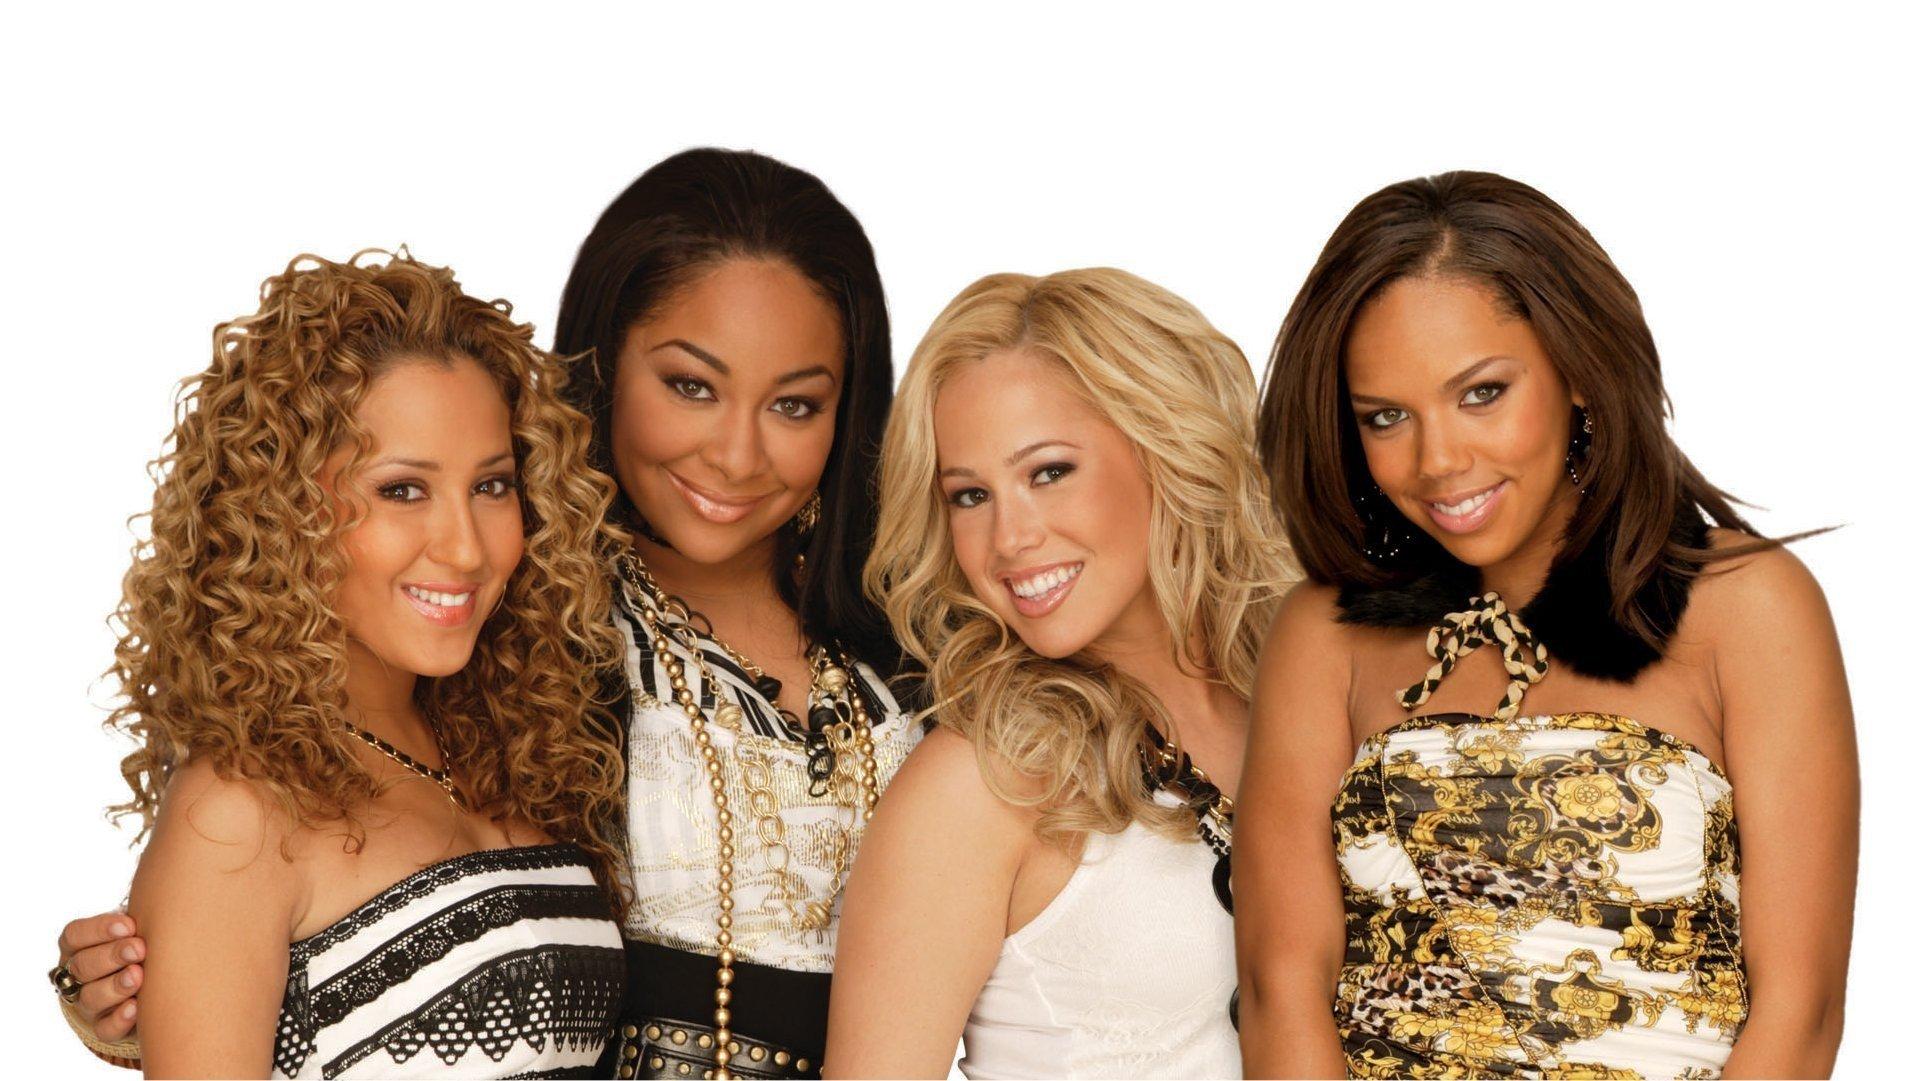 The Cheetah Girls смотреть фото